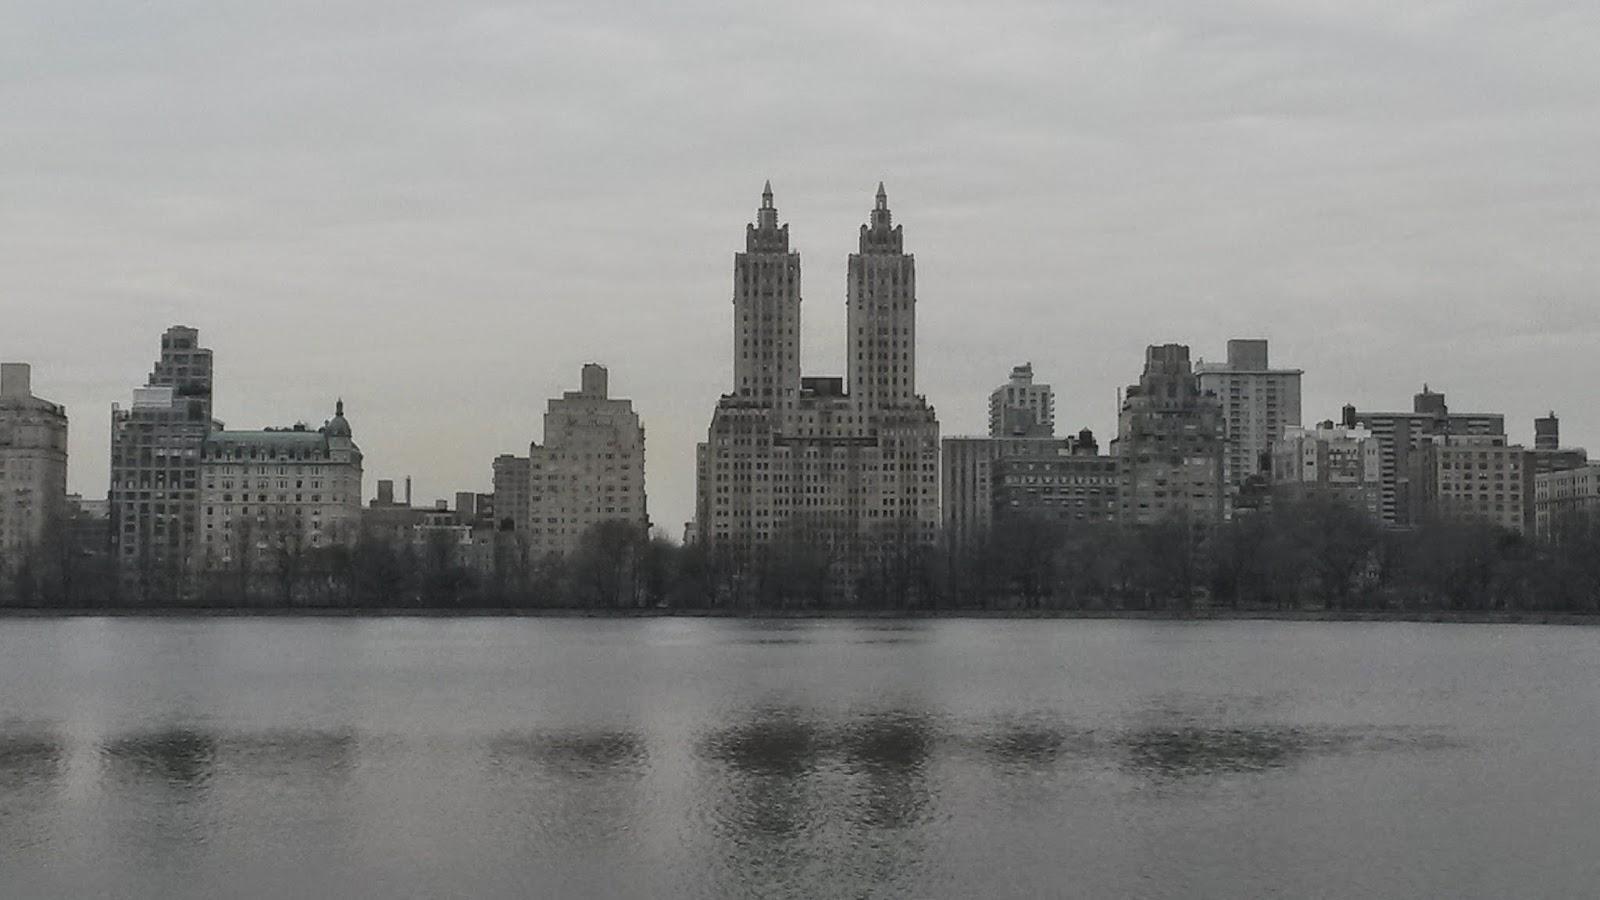 Central Park, Manhattan, New York, Elisa N, Blog de Viajes, Lifestyle, Travel